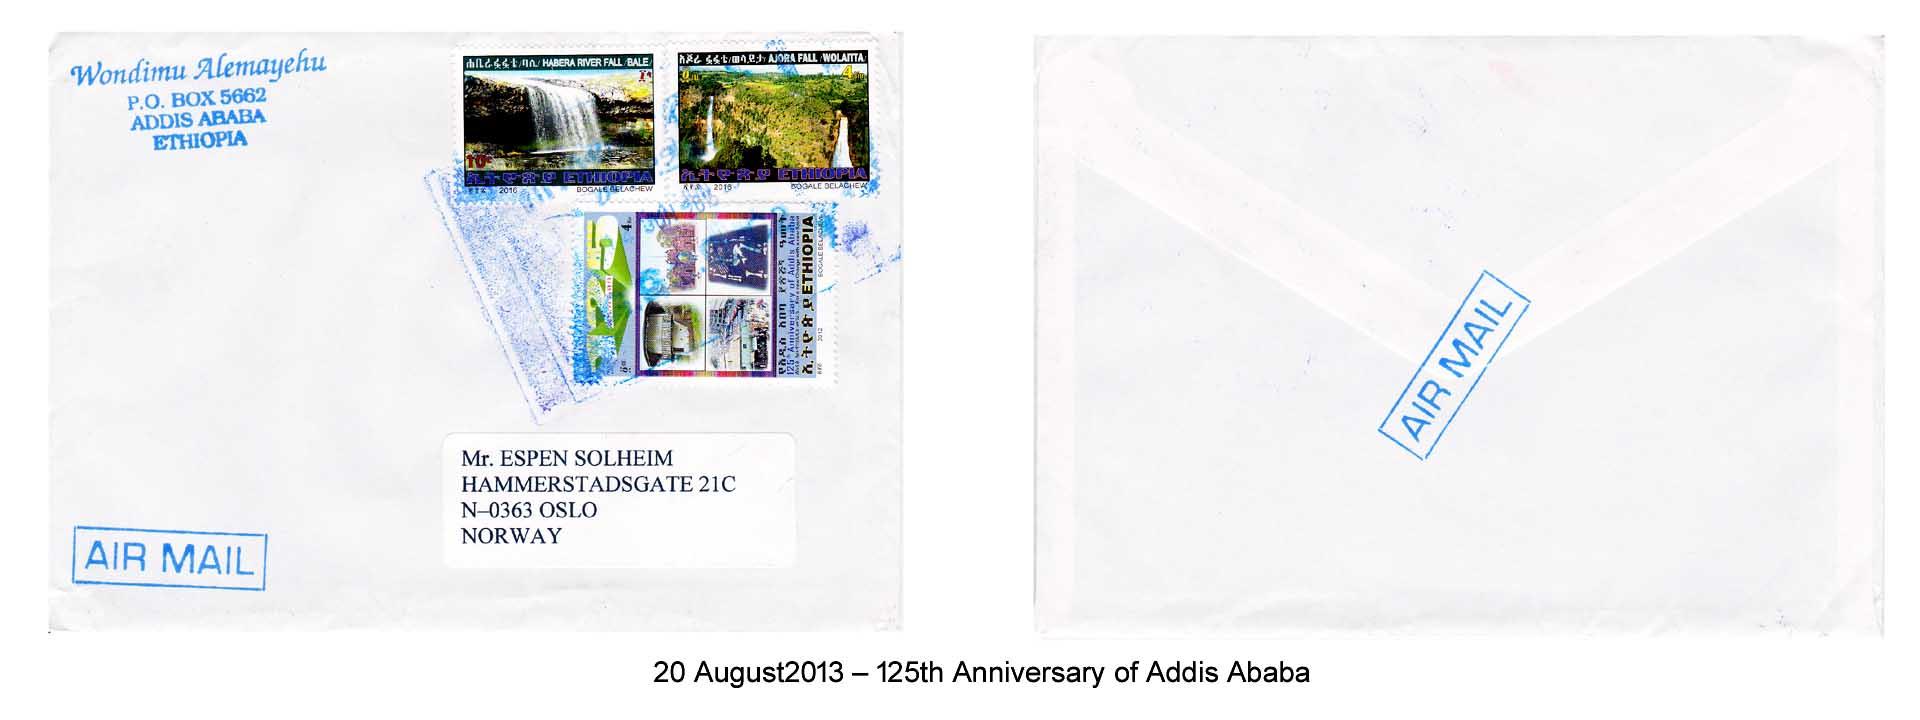 20130820 – 125 Anniversary of Addis Ababa